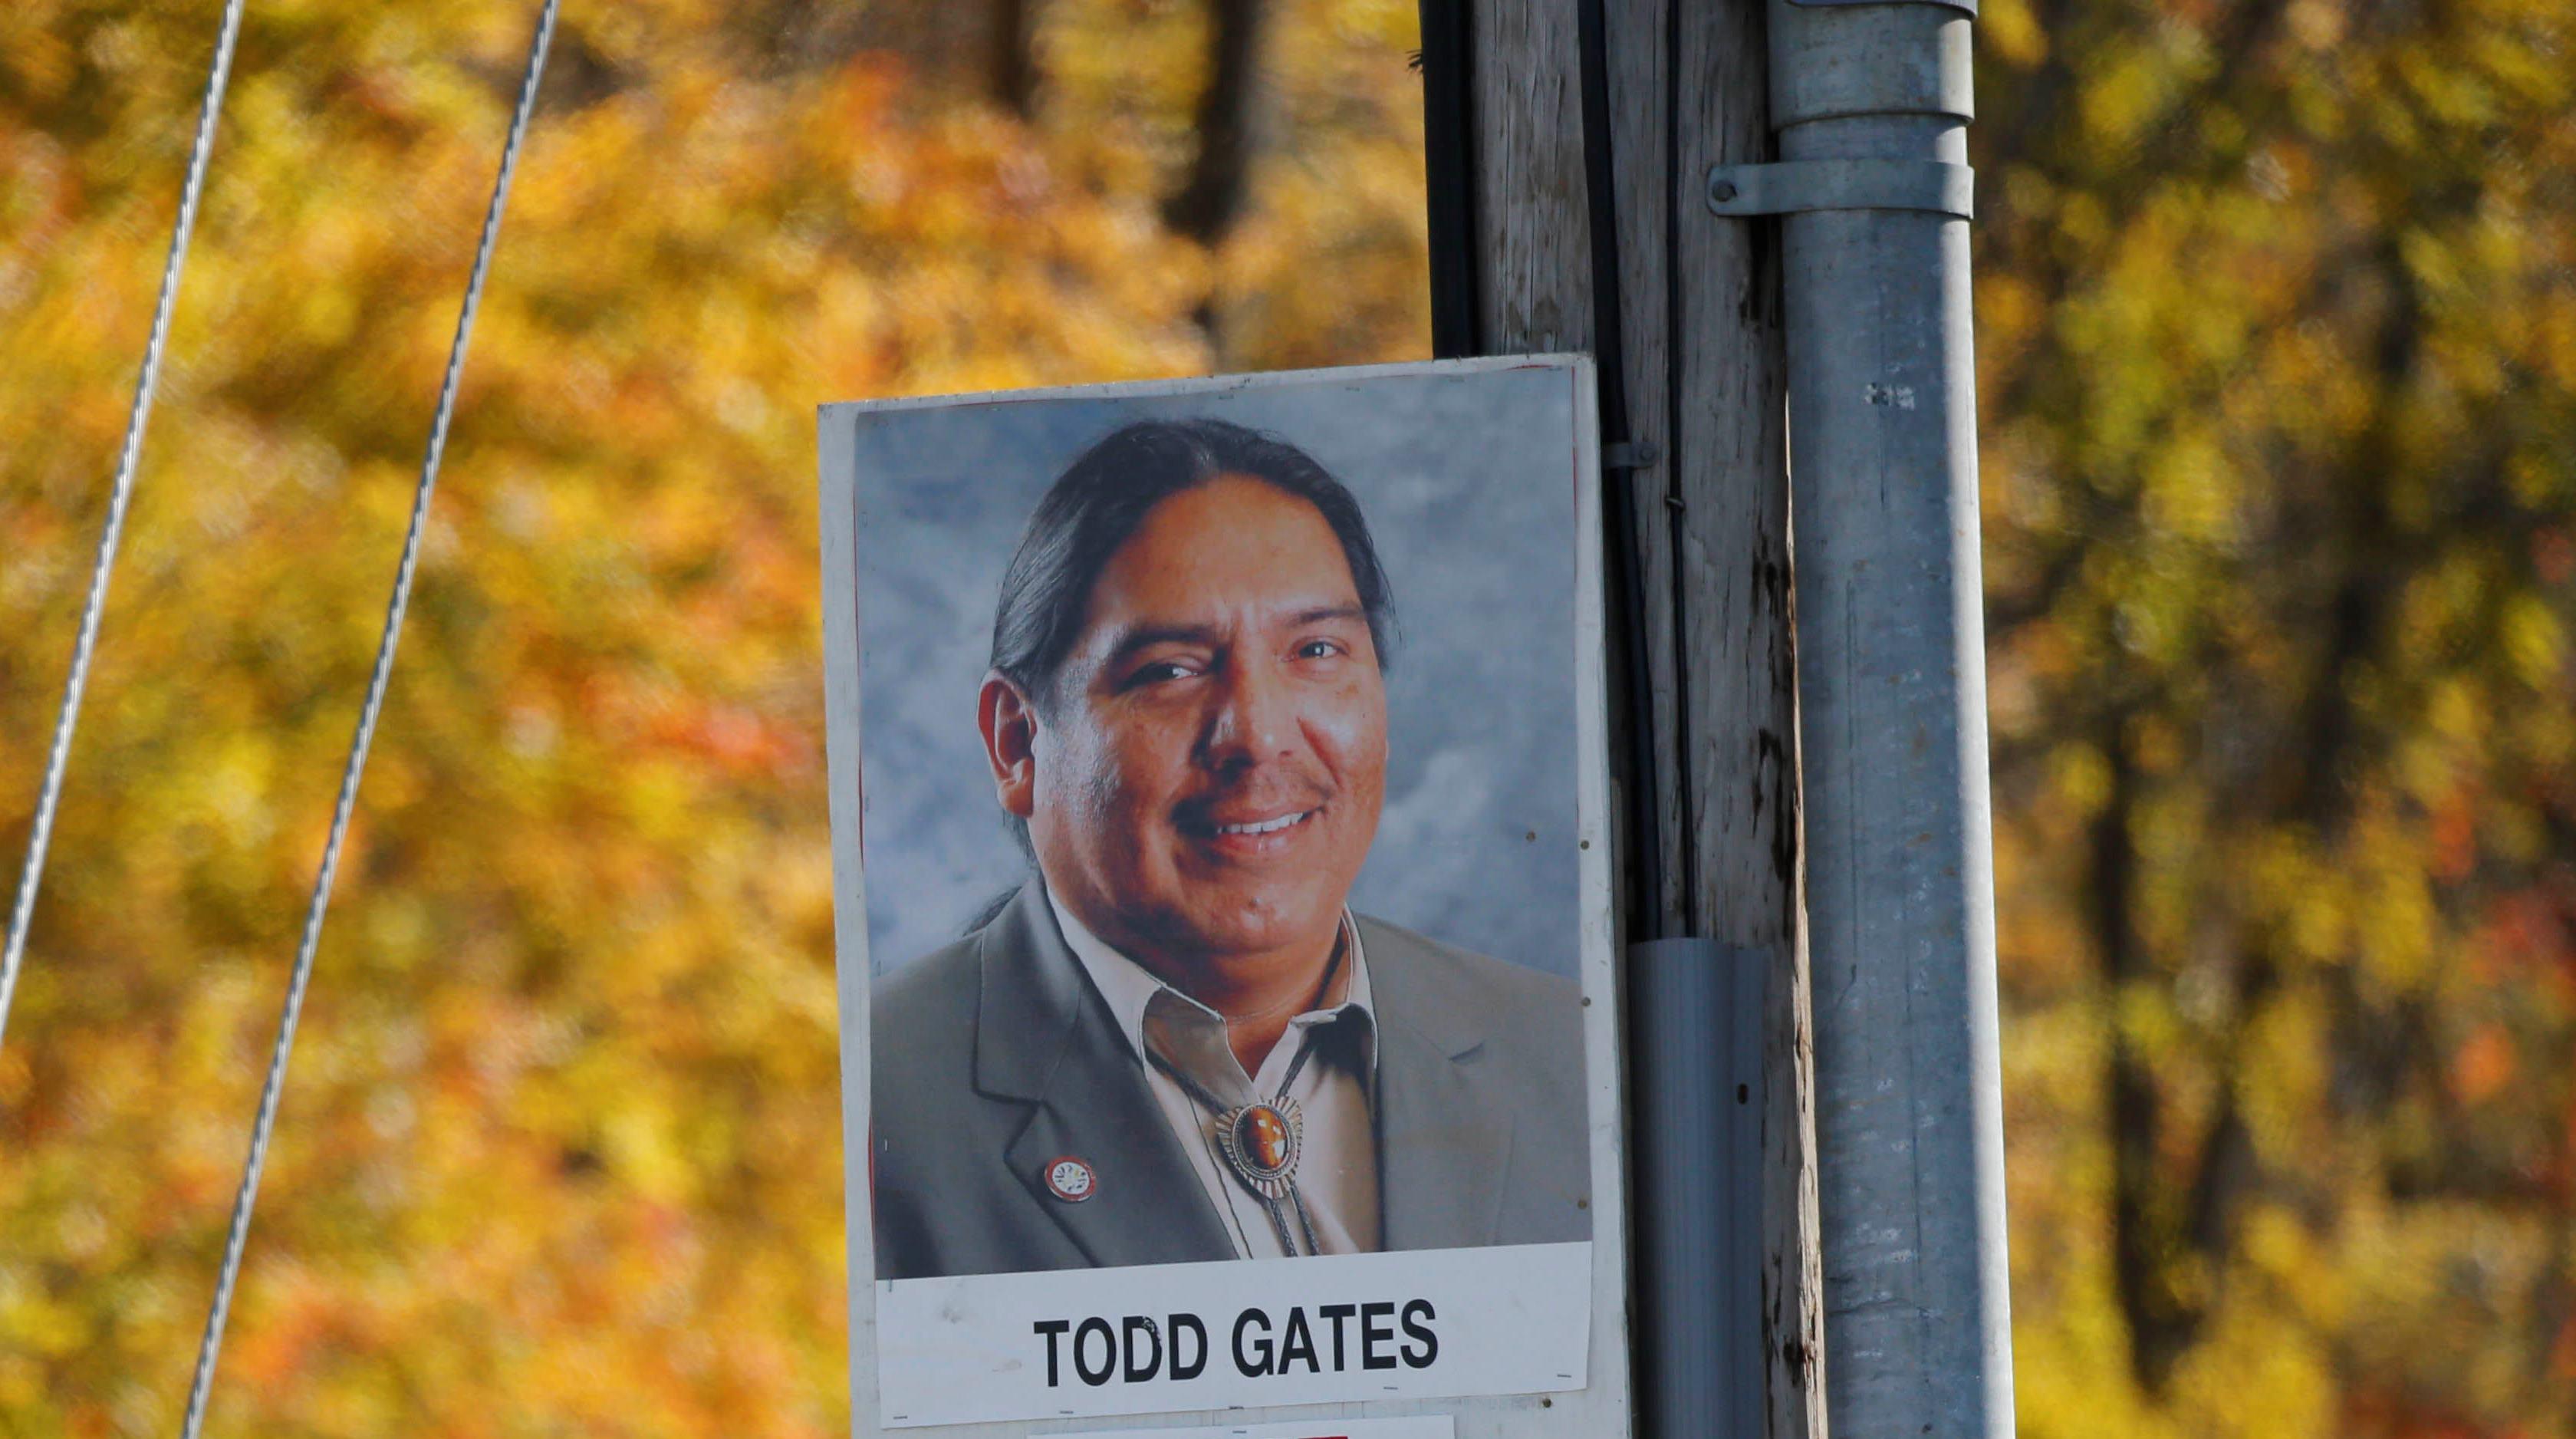 A sign hangs on a lamp pole for Seneca Nation President Todd Gates.  (Derek Gee/Buffalo News)